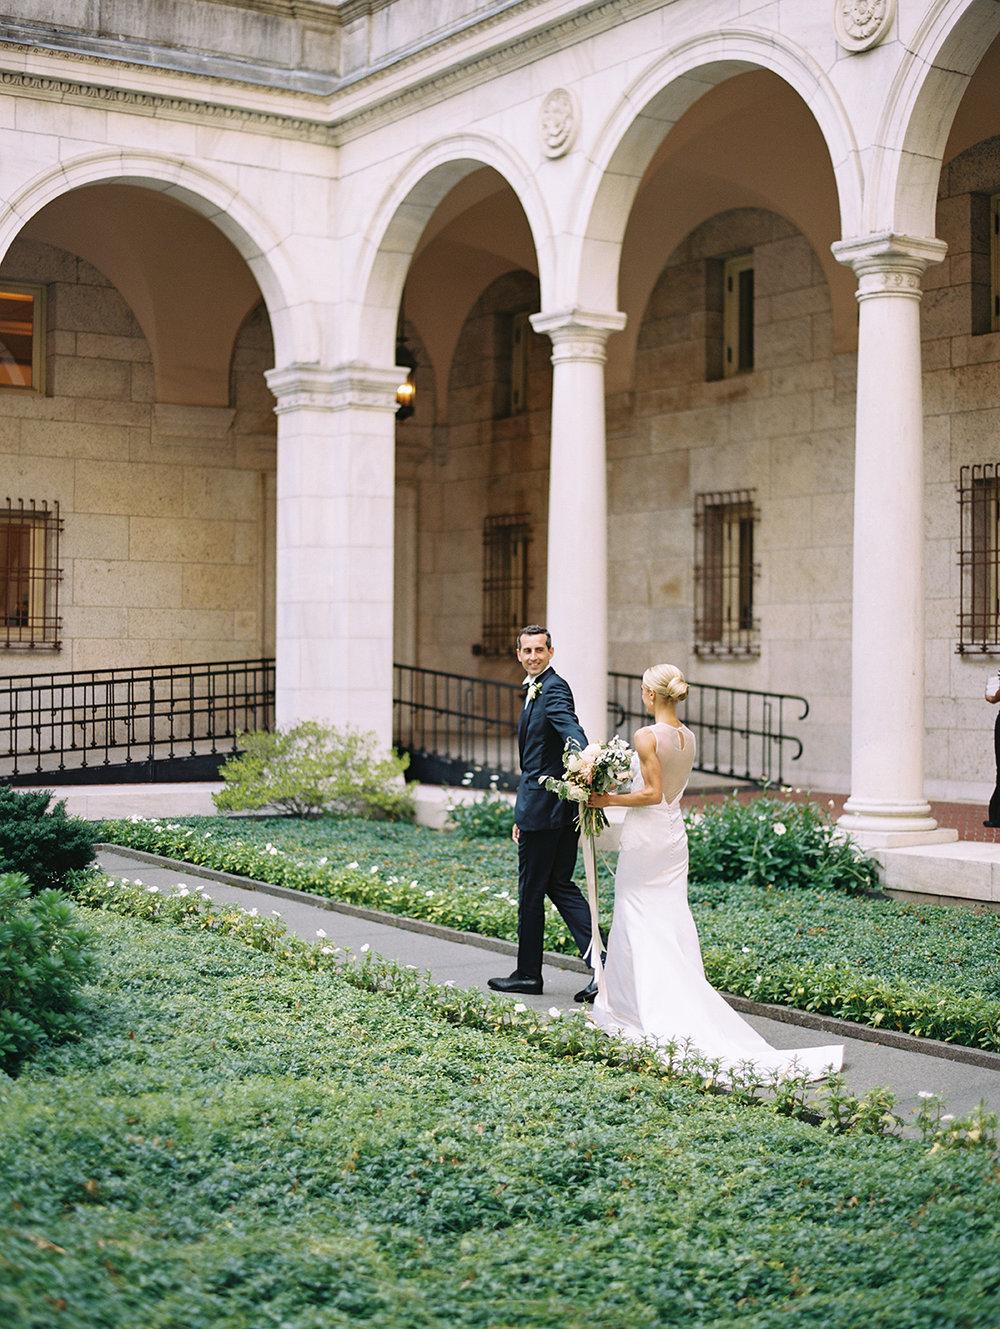 308_Kent+Katie_Fine_Art_Film_Photography_Boston_Public_Library_Wedding_Brumley & Wells.jpg